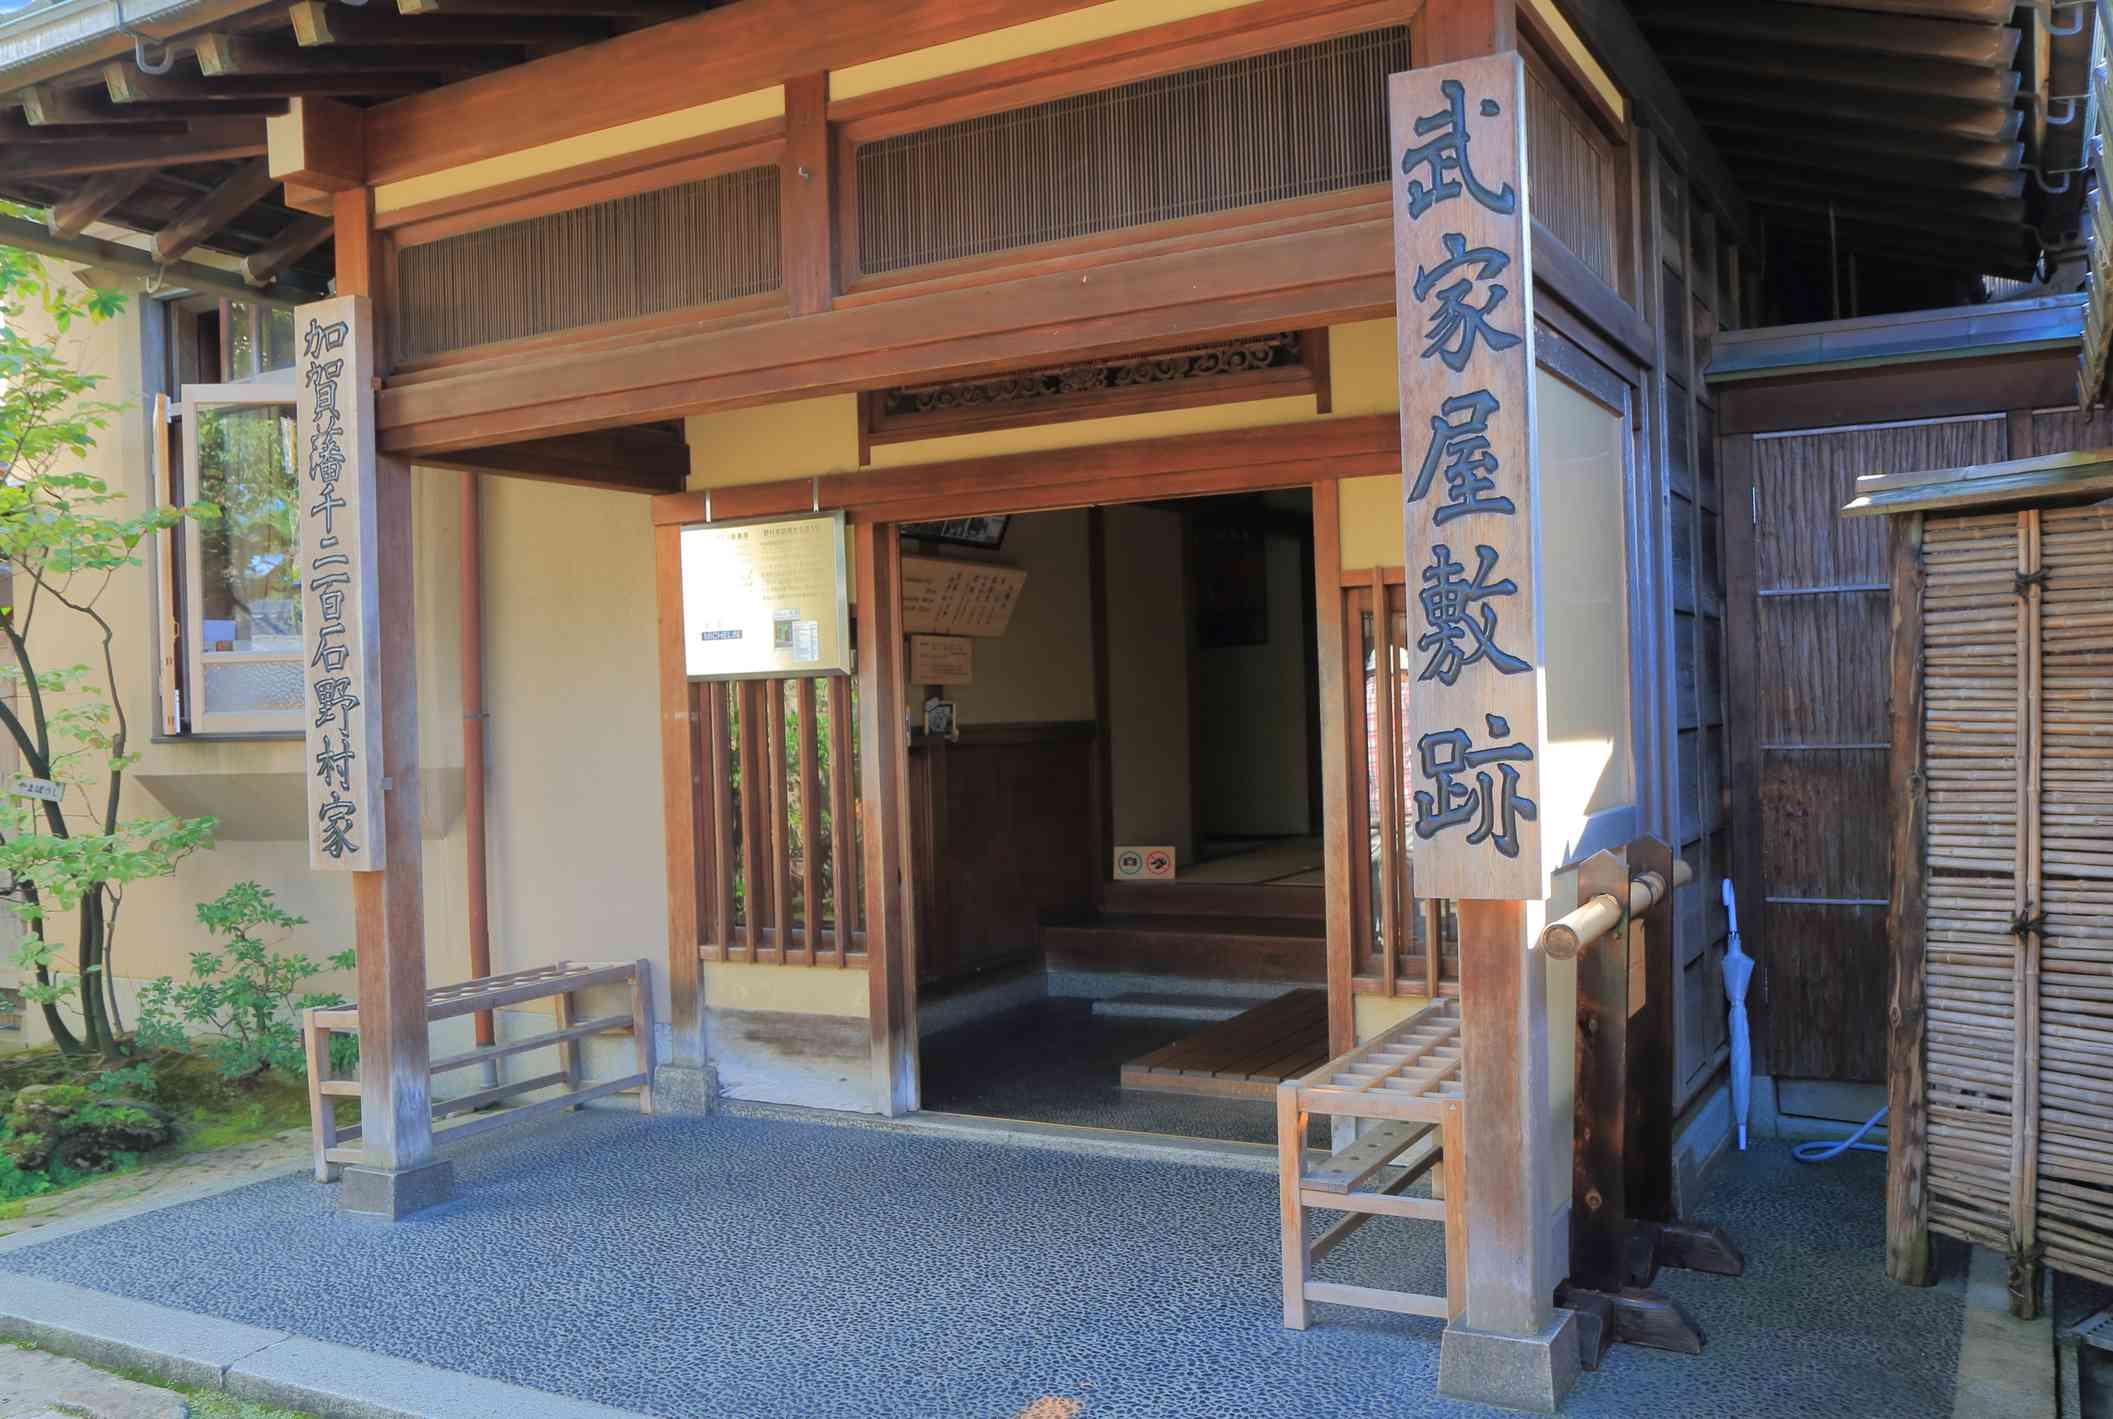 Nomura Bukeyashiki Samurai house entrance in Kanazawa Japan